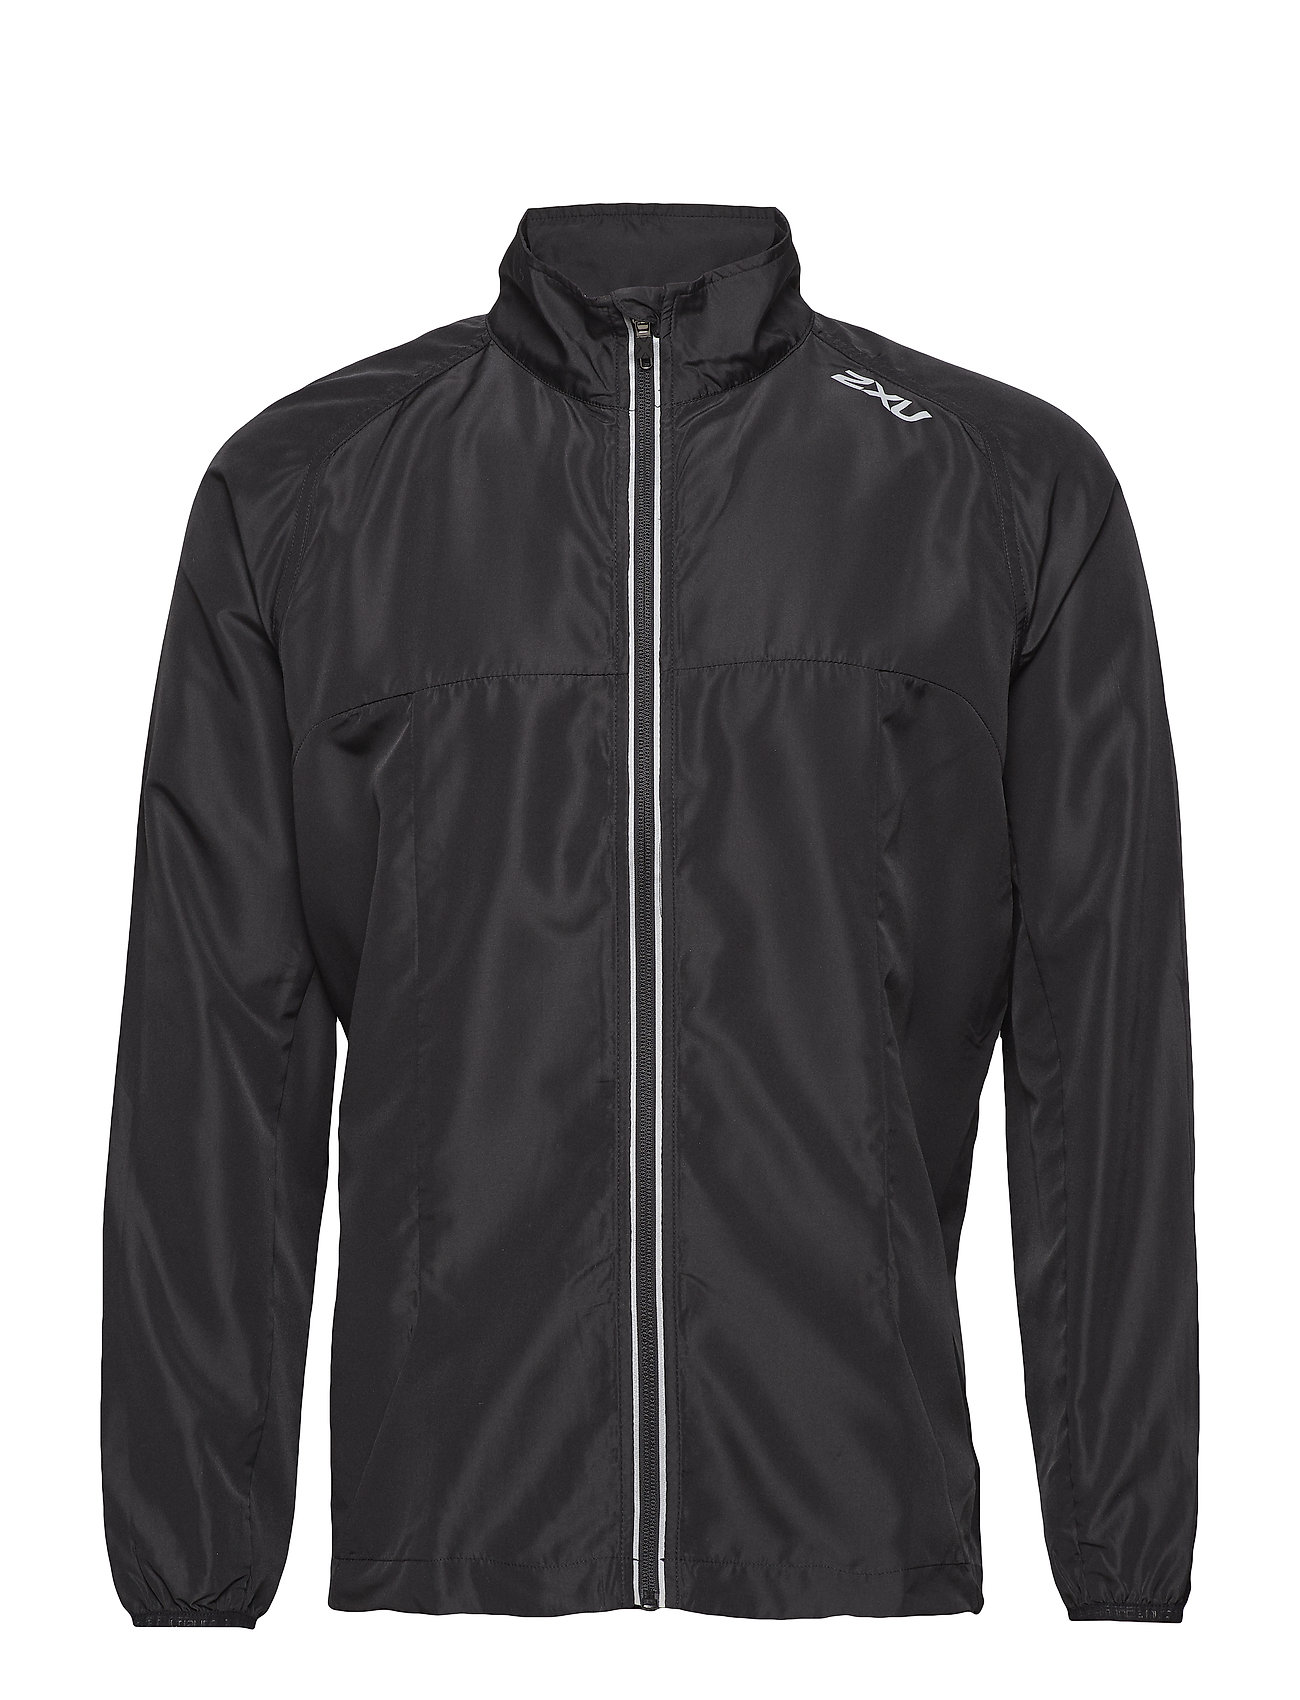 2XU X-Vent Run Jacket 463182554